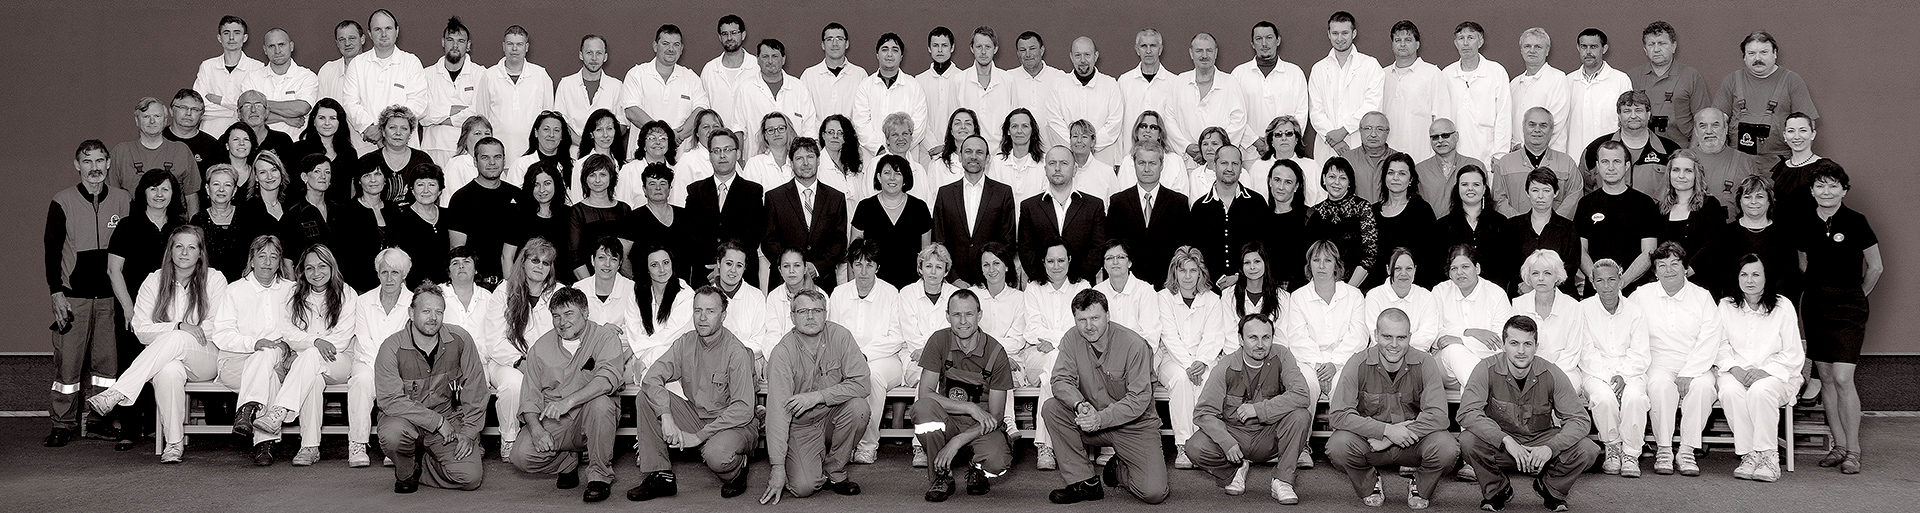 Skupinové foto